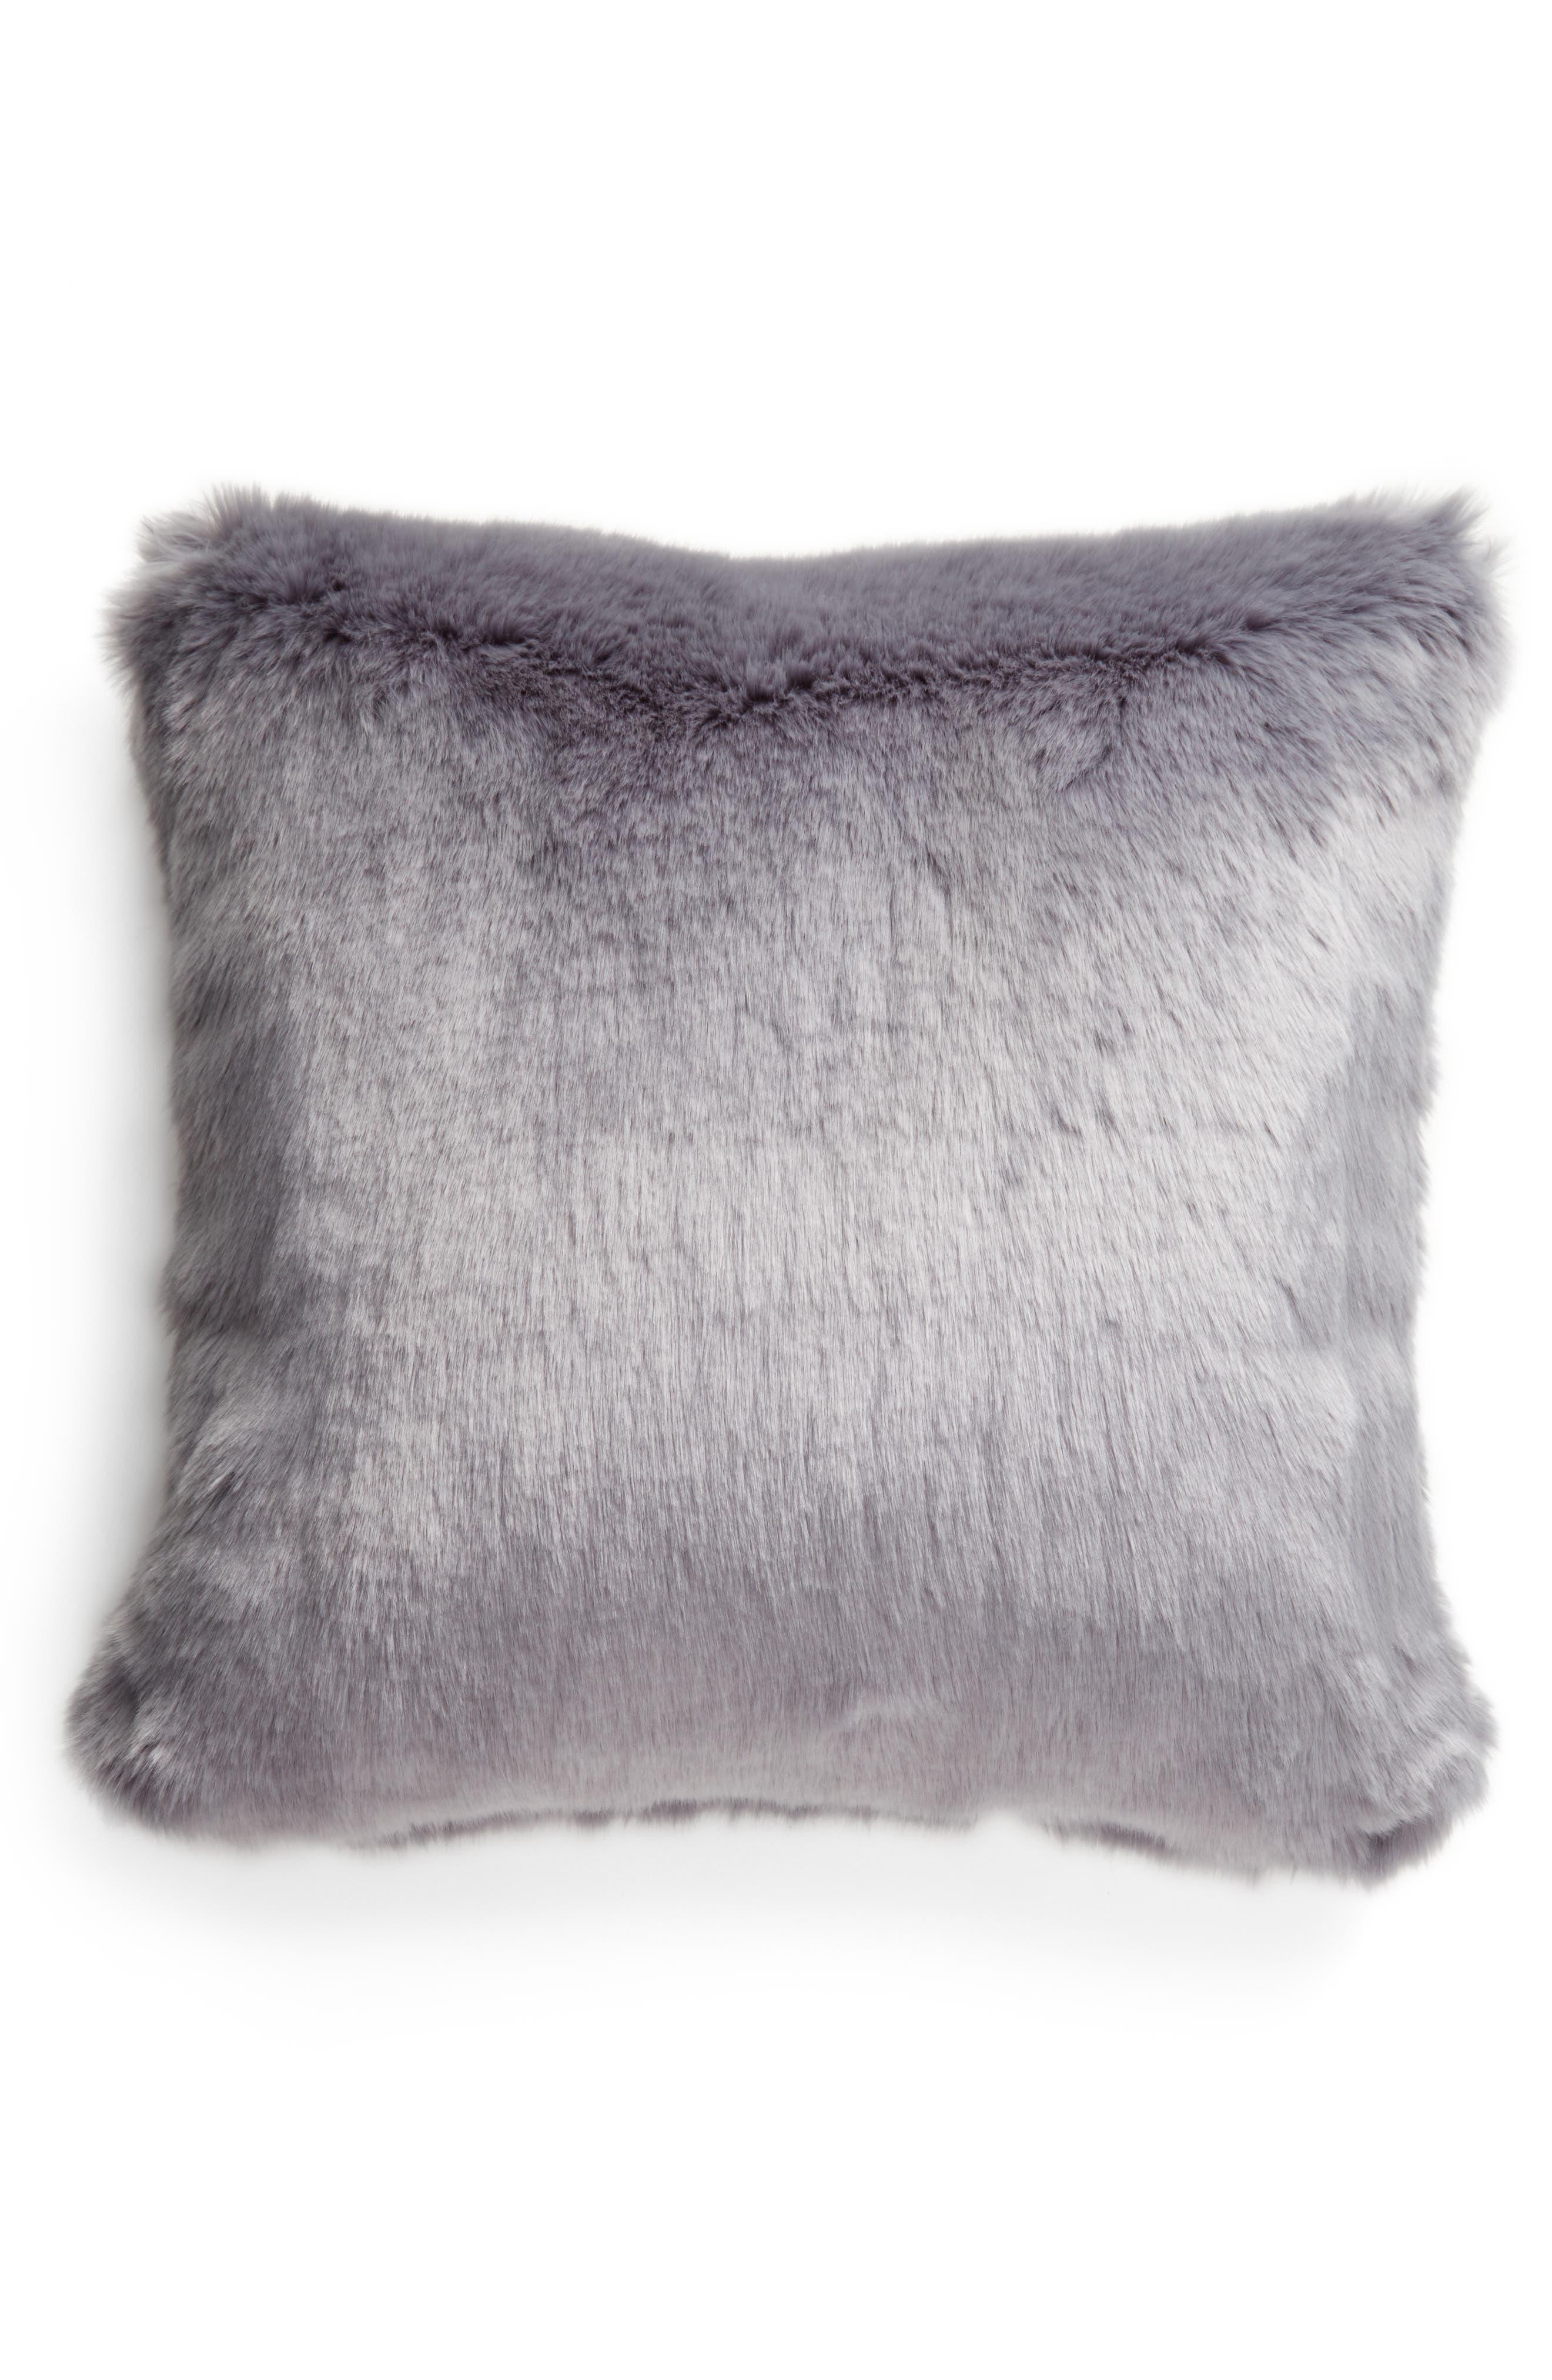 Cuddle Up Faux Fur Pillow,                             Main thumbnail 1, color,                             BLUE TRADEWINDS